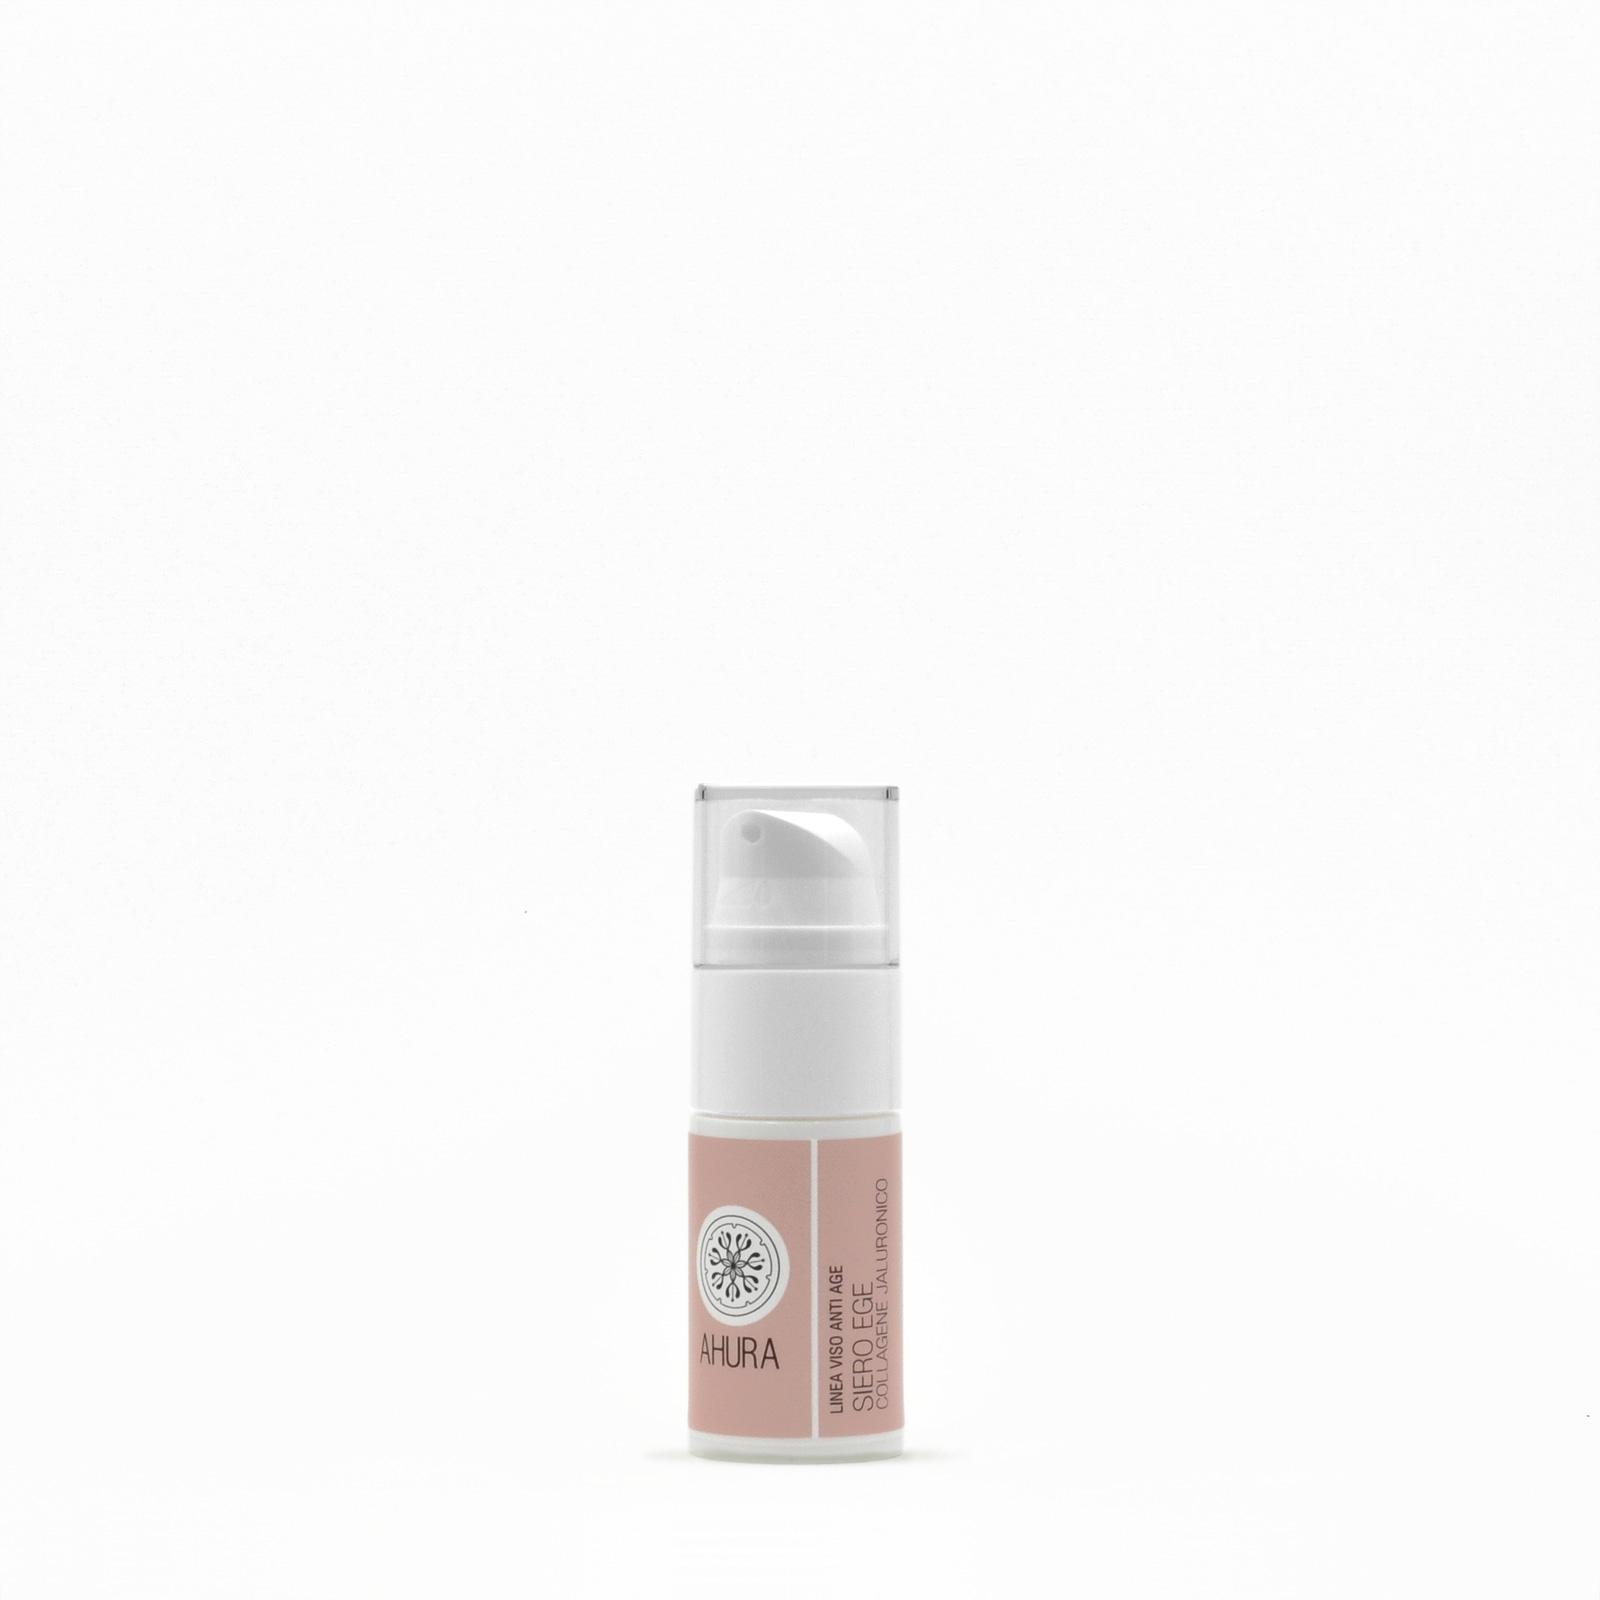 A0301 siero ege collagene jaluronico 01 - Ahura